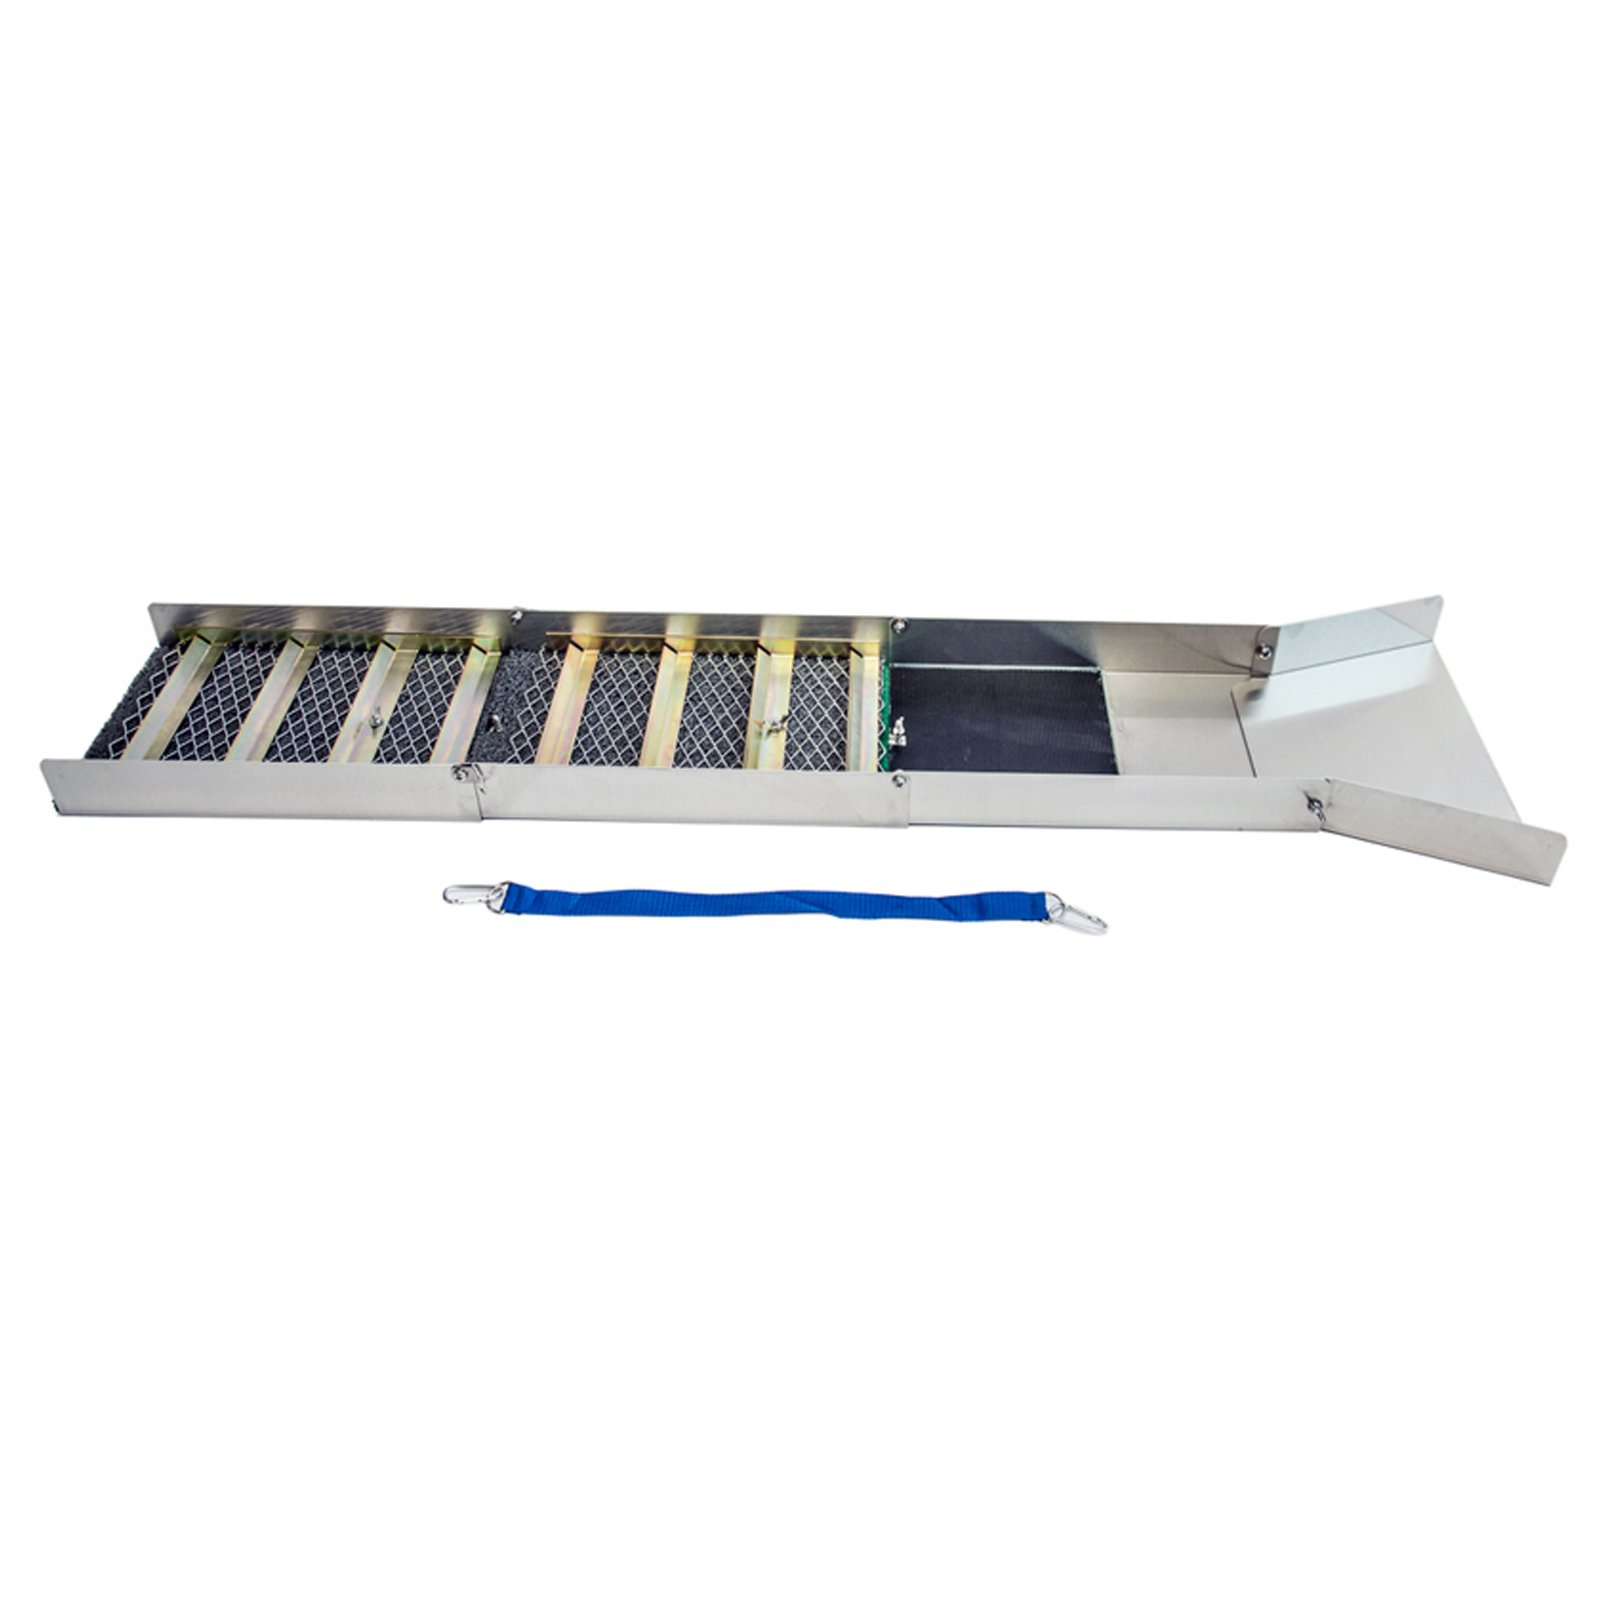 ASR Outdoor Gold Rush Portable Aluminum Folding Prospecting Sluice Box, 50 Inch